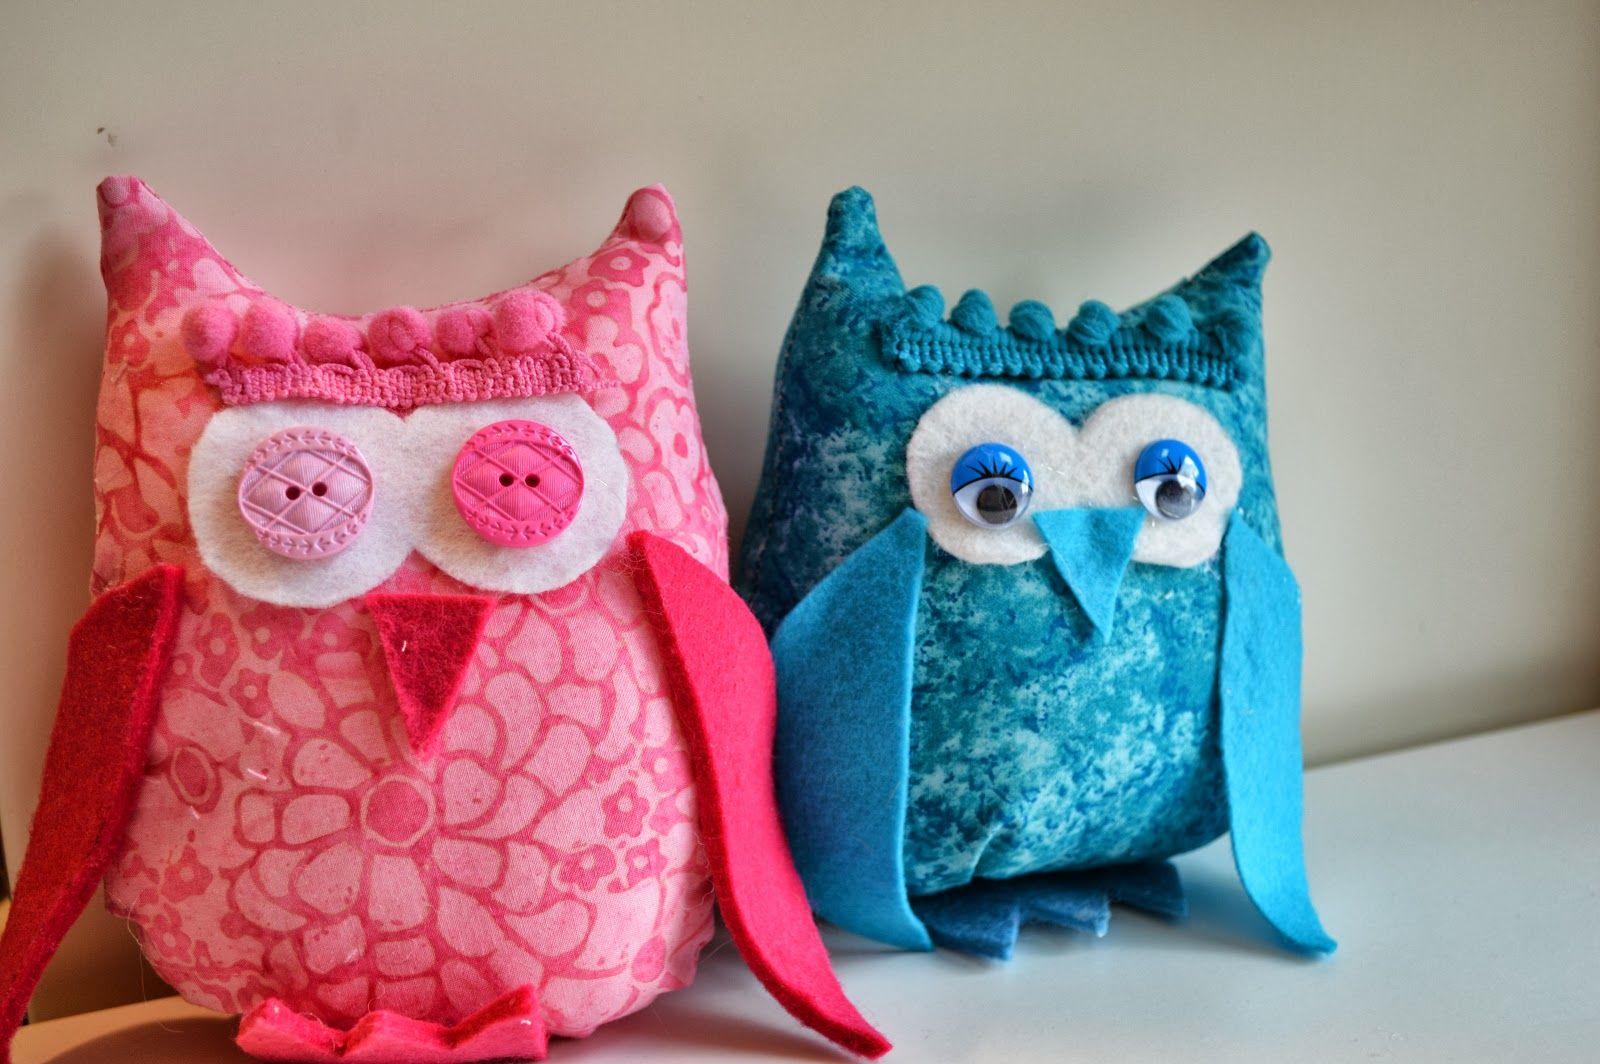 Rosa e Turchese: Little creatures